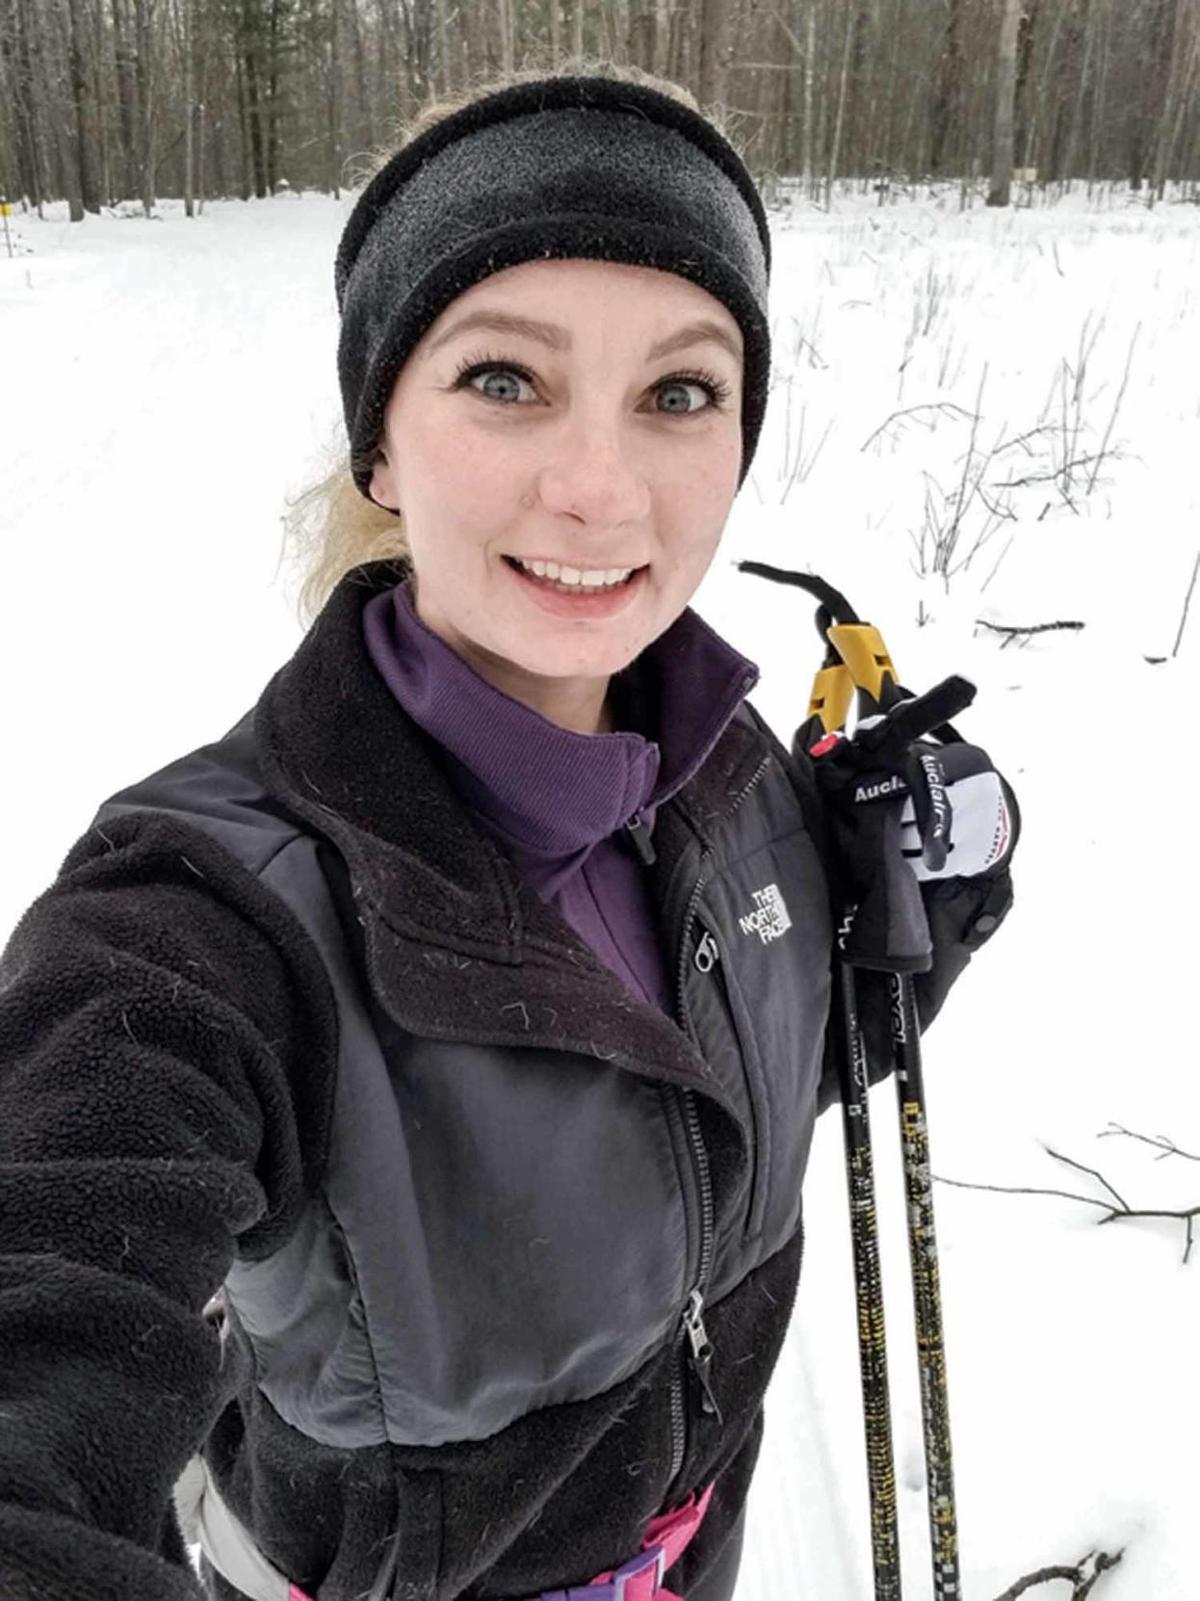 2-16 Cross Country SkiingC_HANNAH-2.jpg